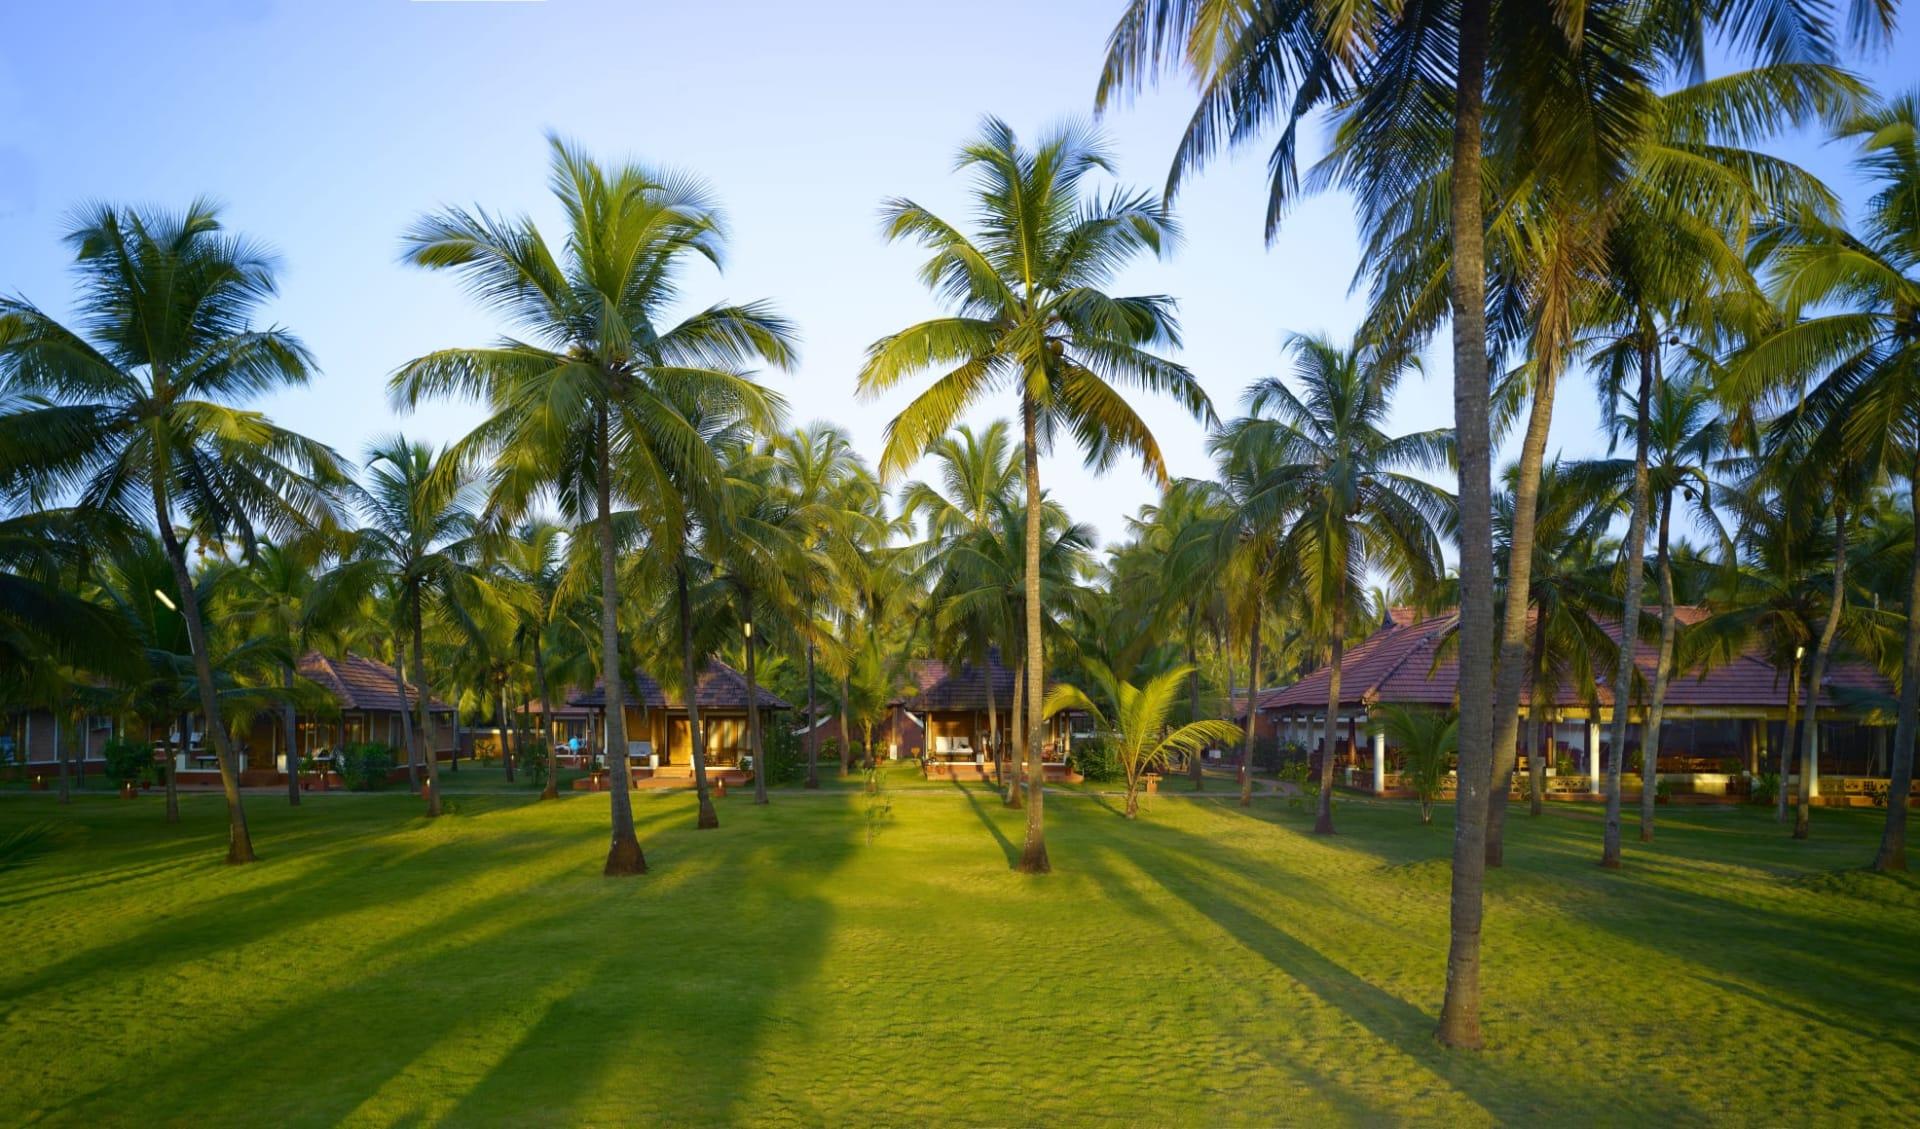 Nattika Beach Ayurveda Resort in Kochi: Exterior